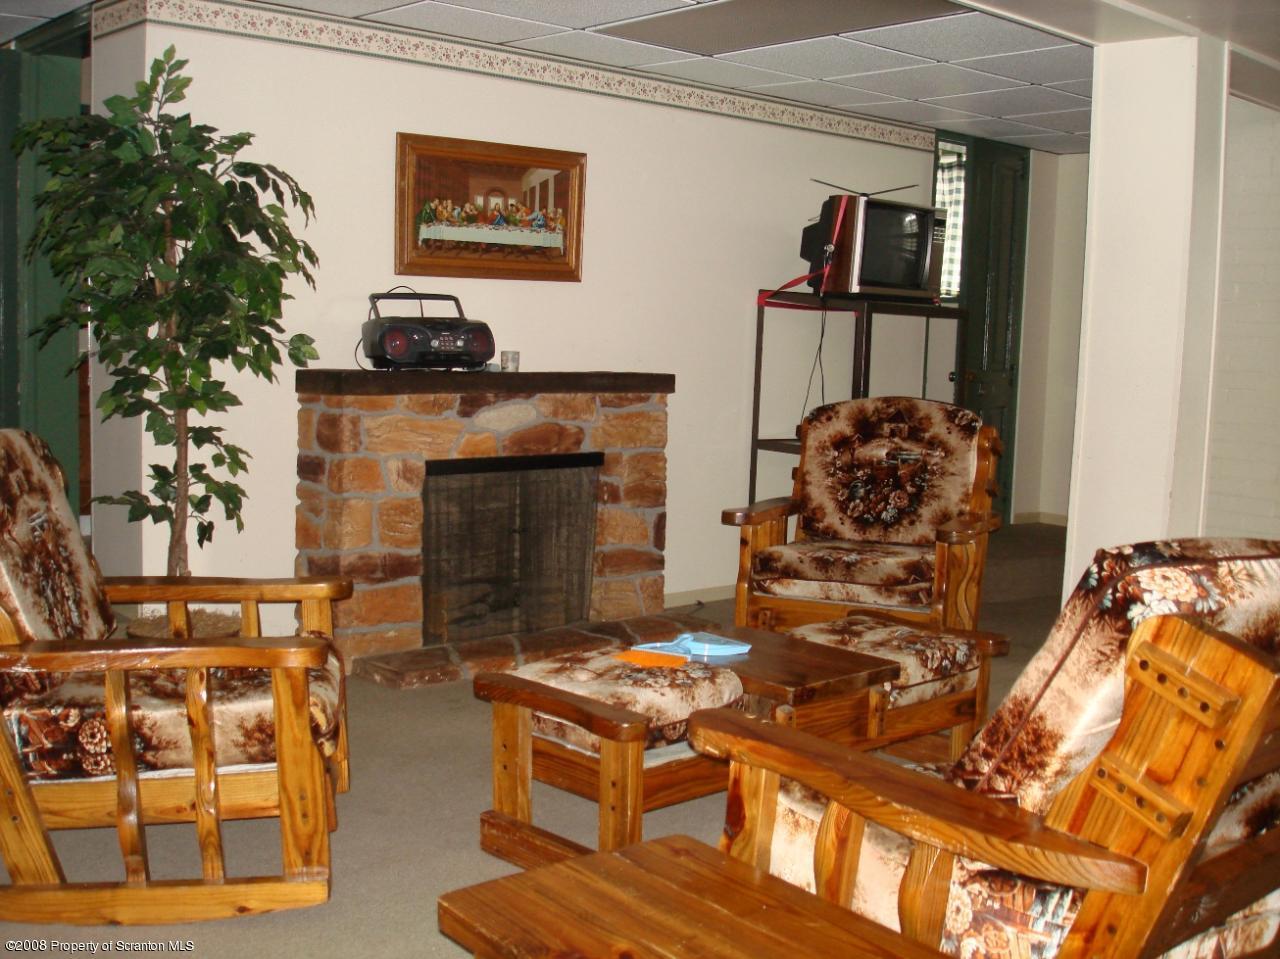 14001 CHURCH HILL RD, Clarks Summit, Pennsylvania 18411, ,3 BathroomsBathrooms,Commercial,For Sale,CHURCH HILL,12-1364